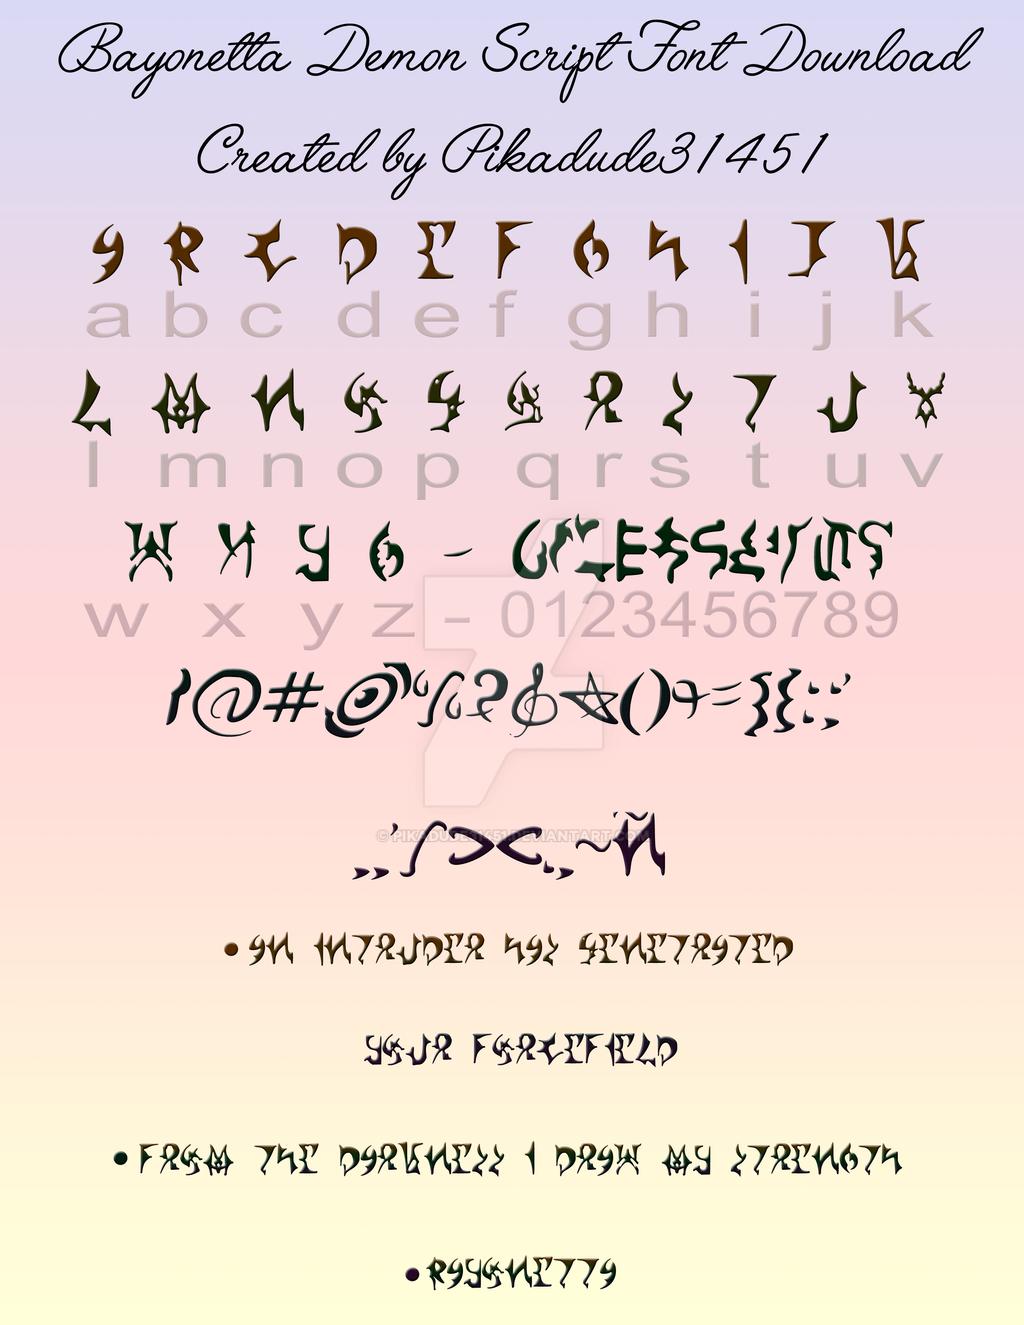 Bayonetta demon script font download by pikadude31451 on Script art